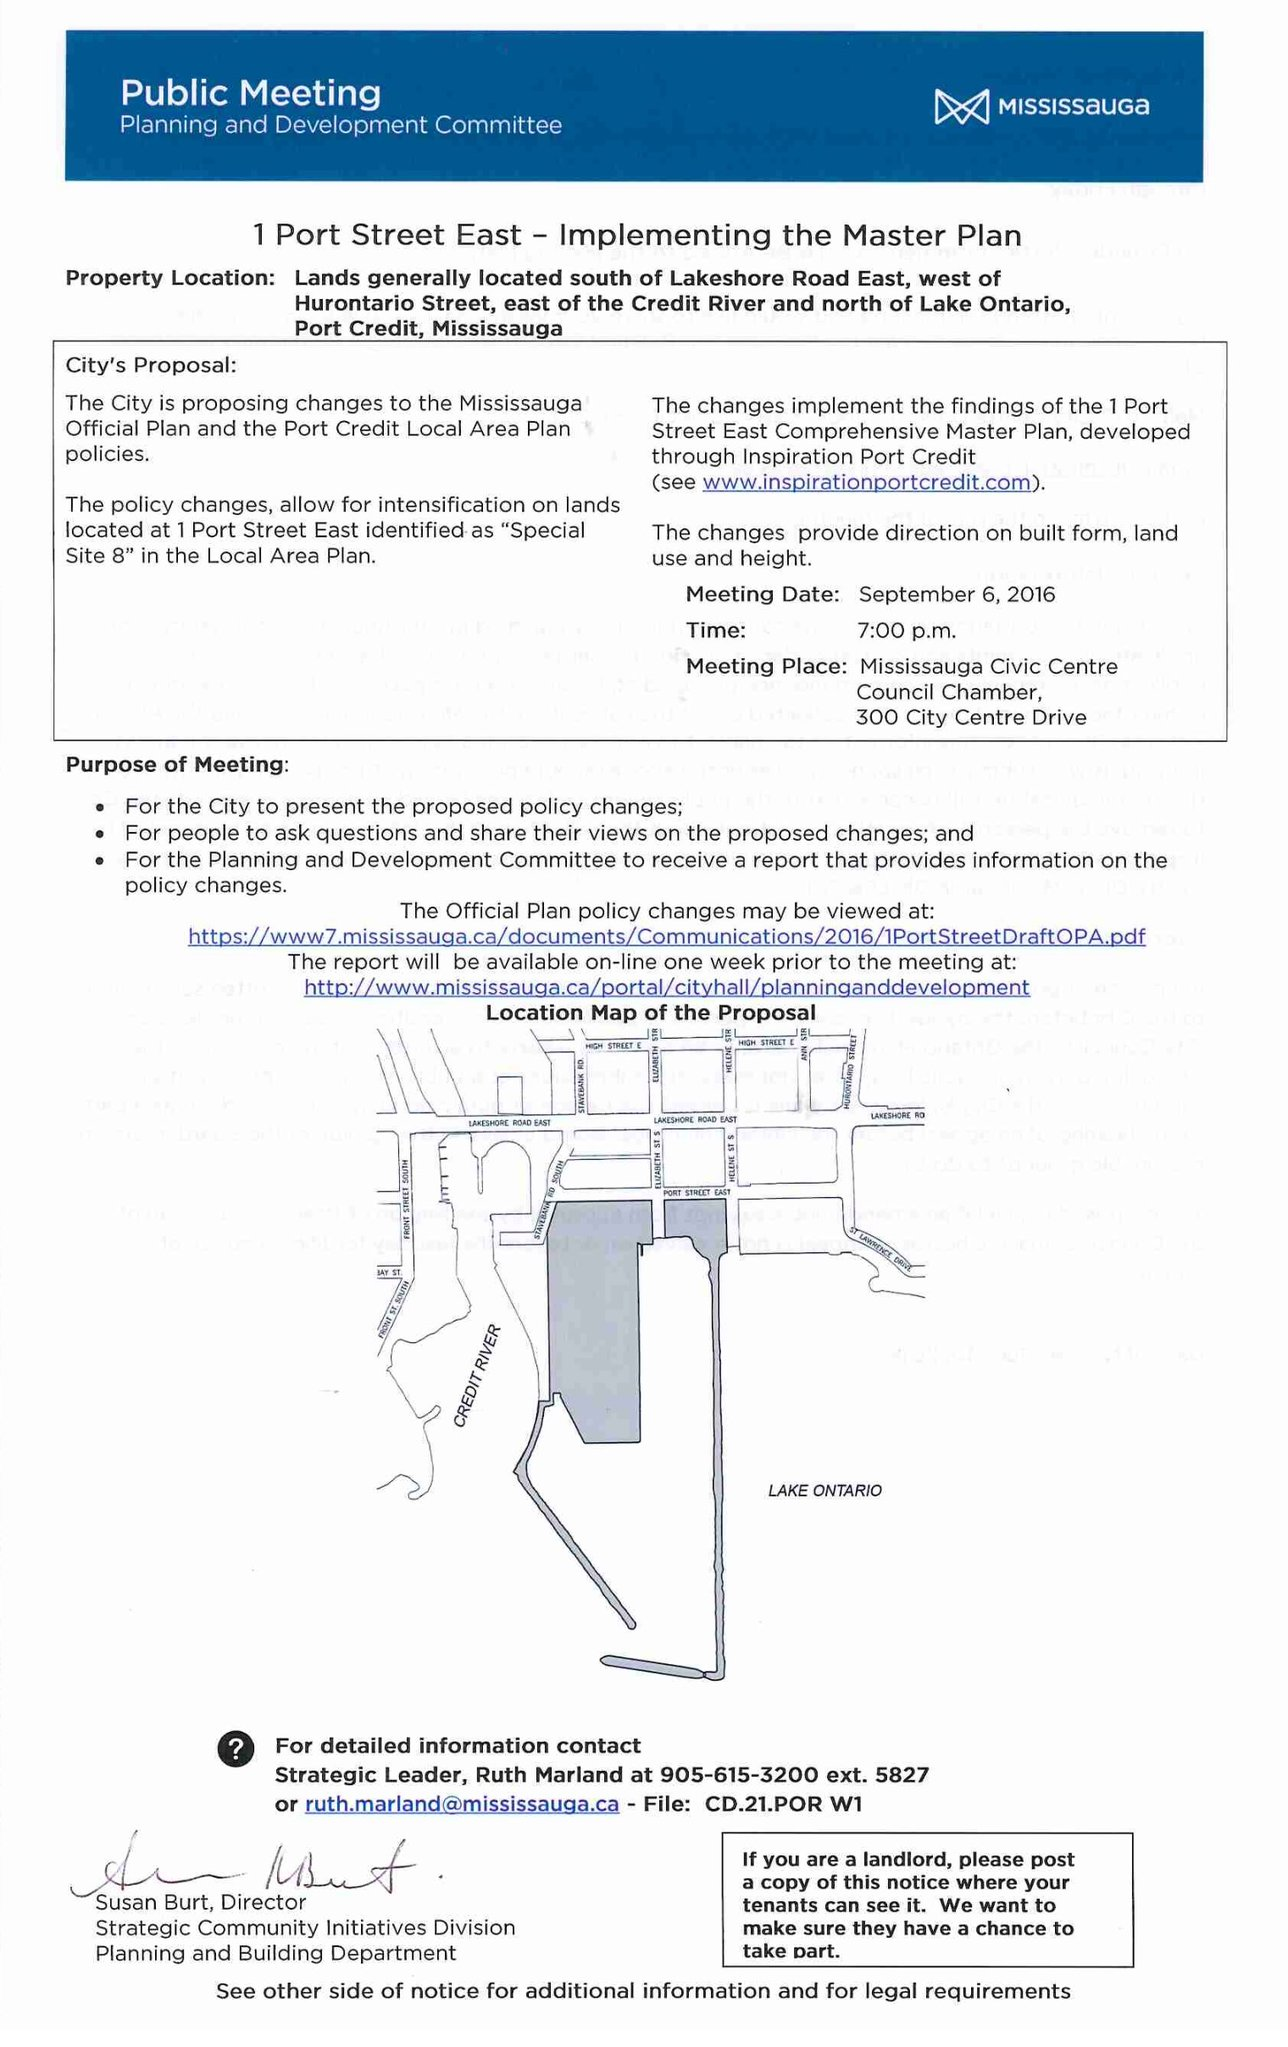 09-06-16 Meeting Notice